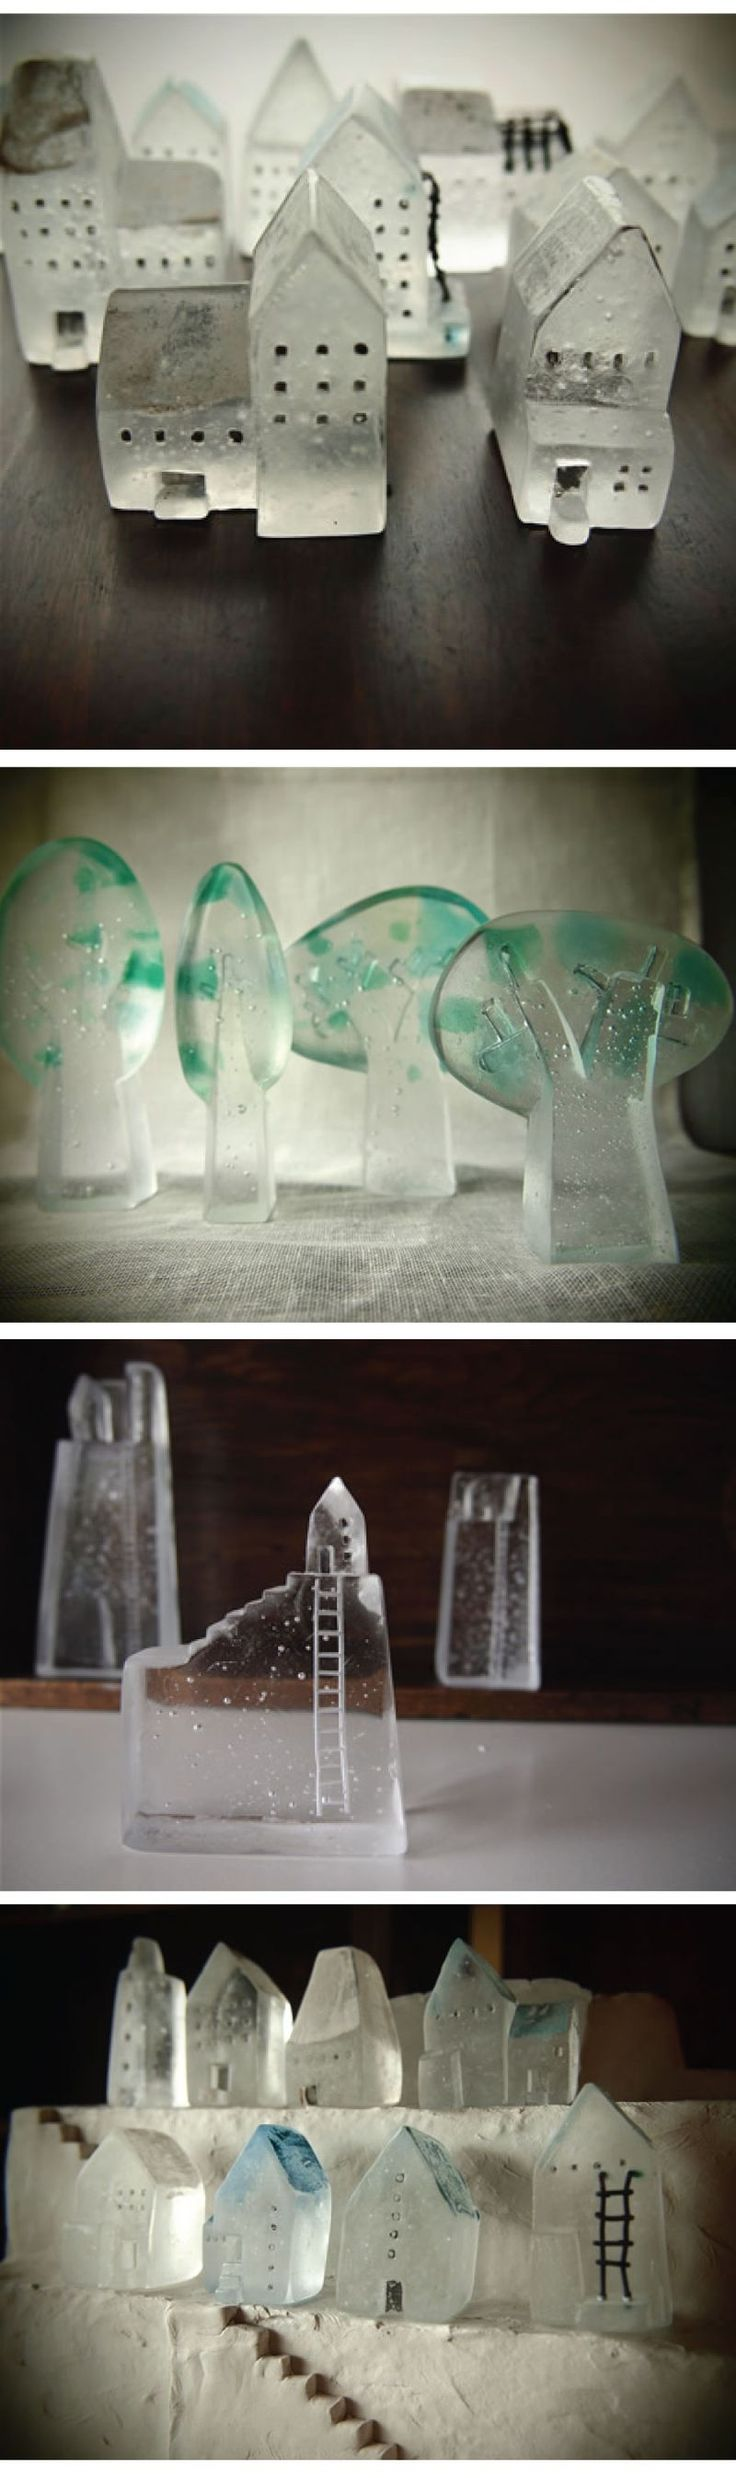 Contemporary Glass | MellowGlass artist, Tanakayumi.